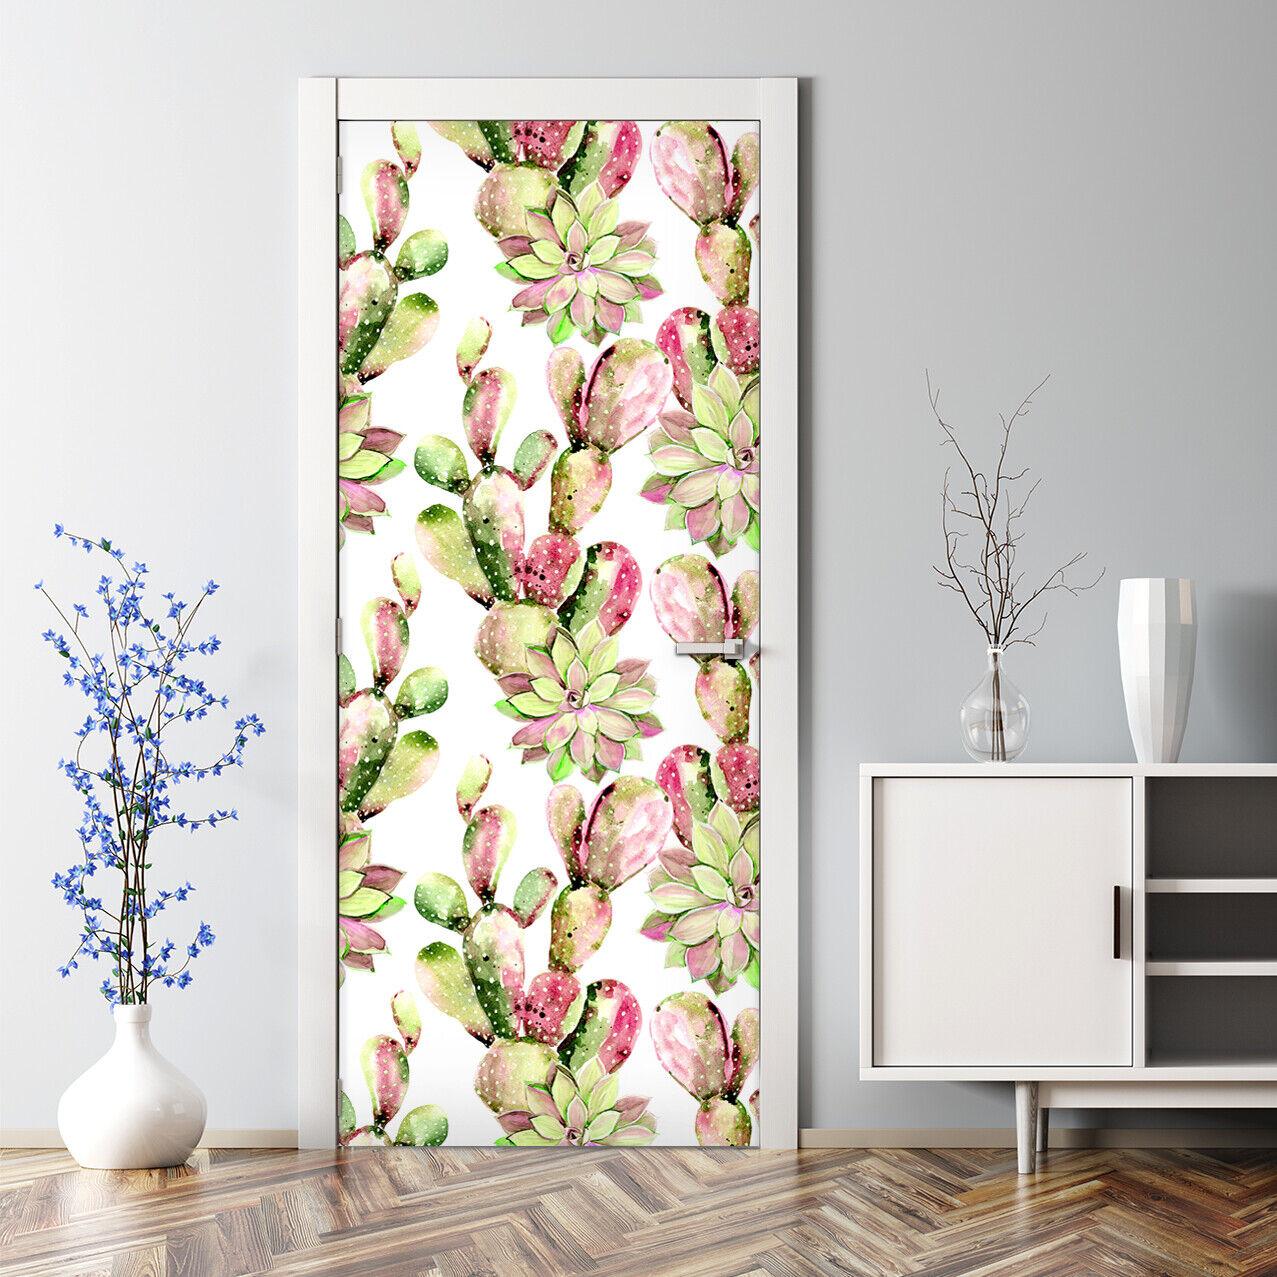 Renters Watercolour Cactus Flower Self Adhesive Door Decal Home Decor